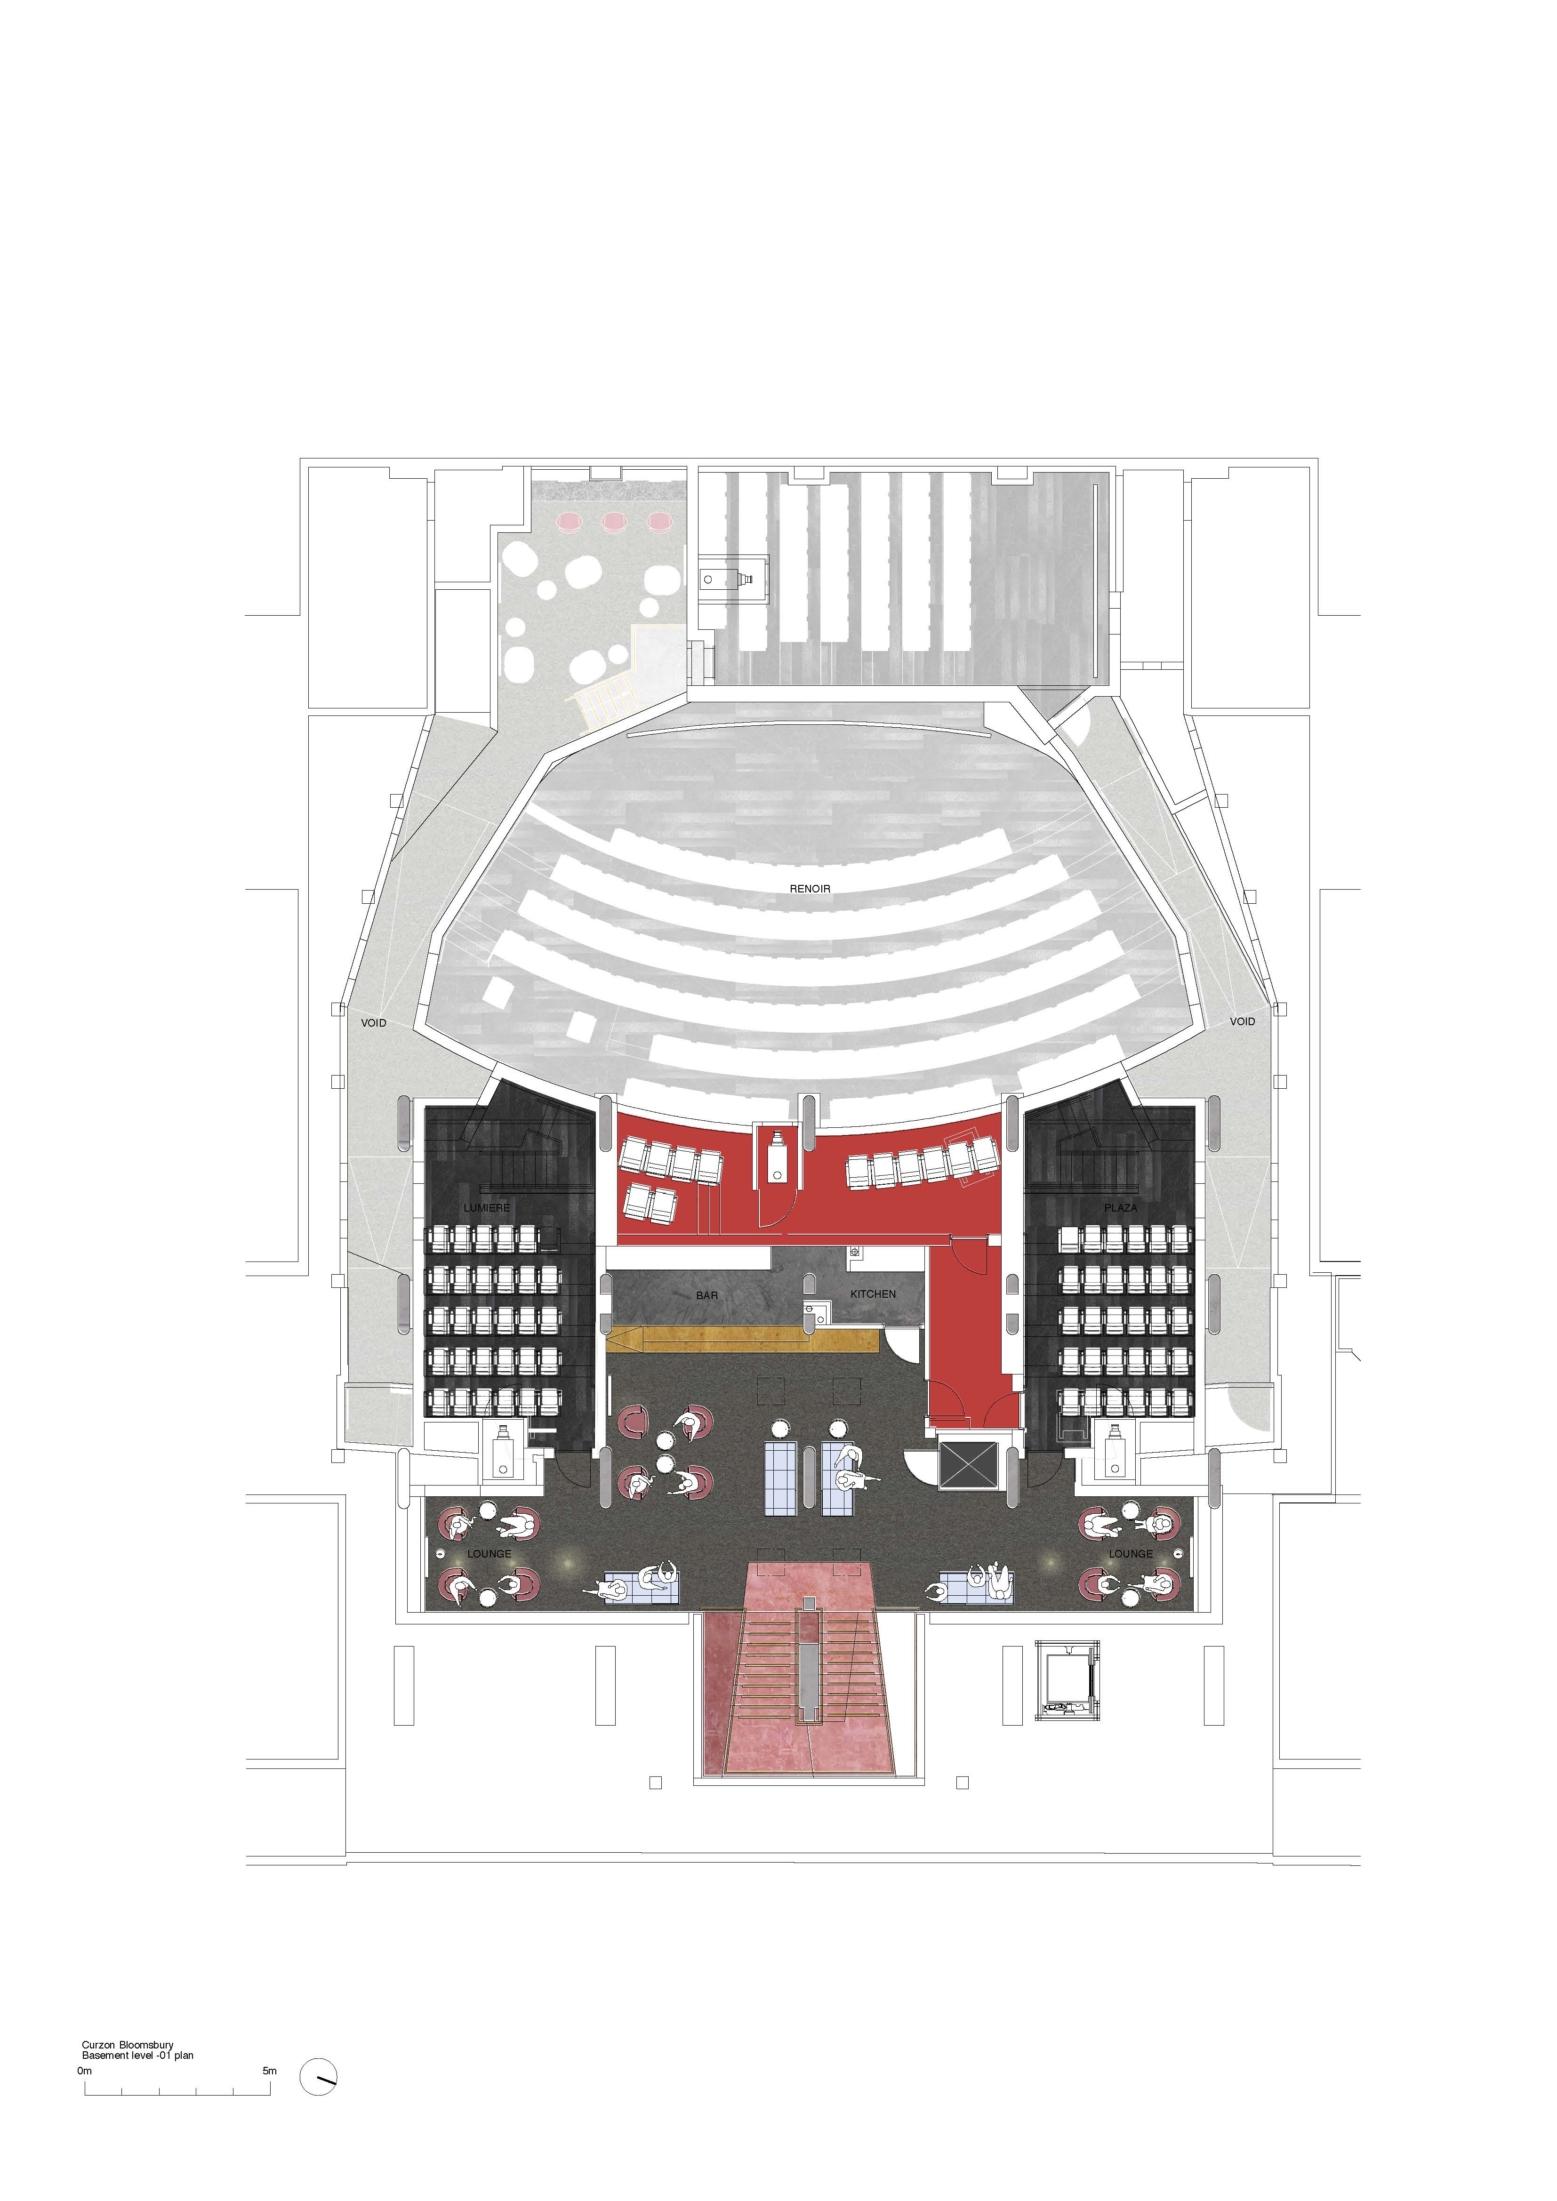 Curzon Bloomsbury_basement level -01 plan